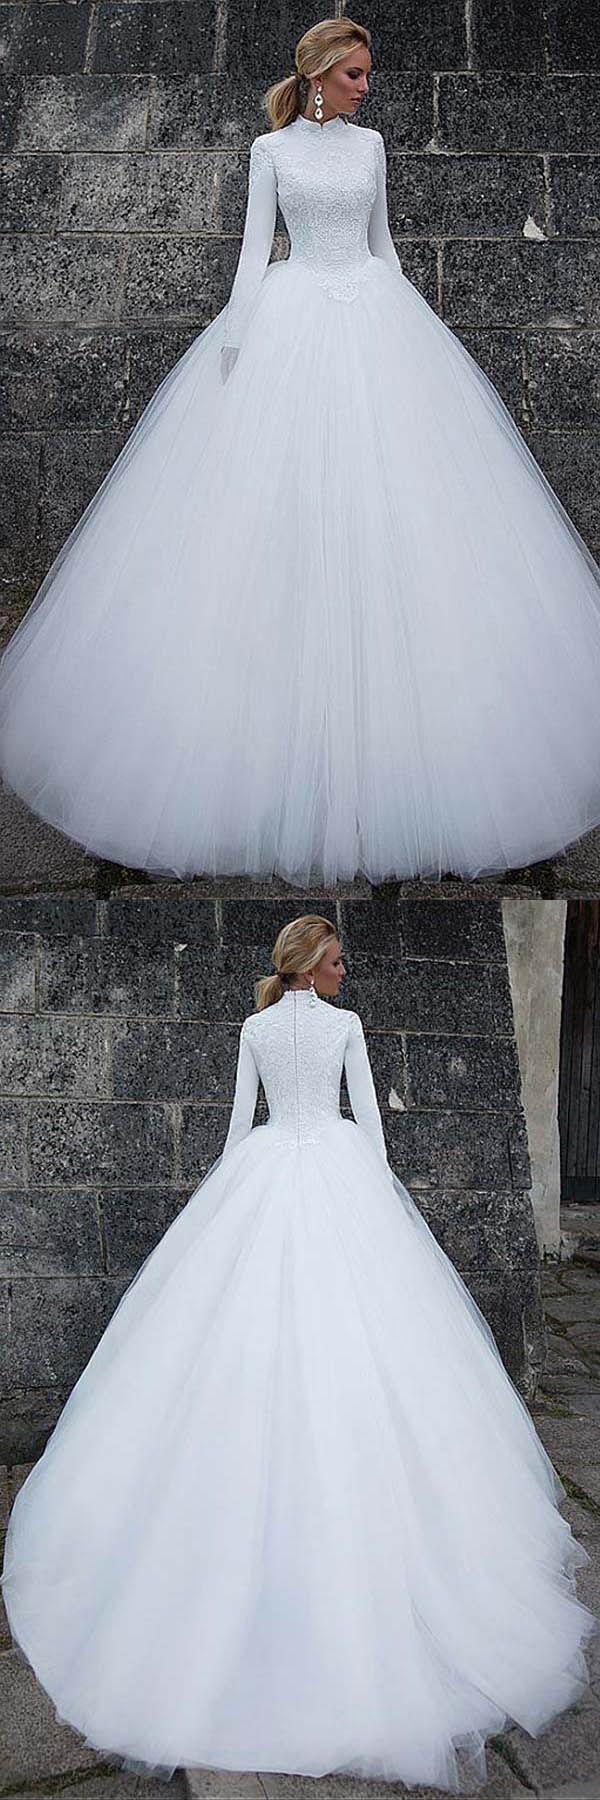 Vintage satin high collar natural waistline ball gown wedding dress